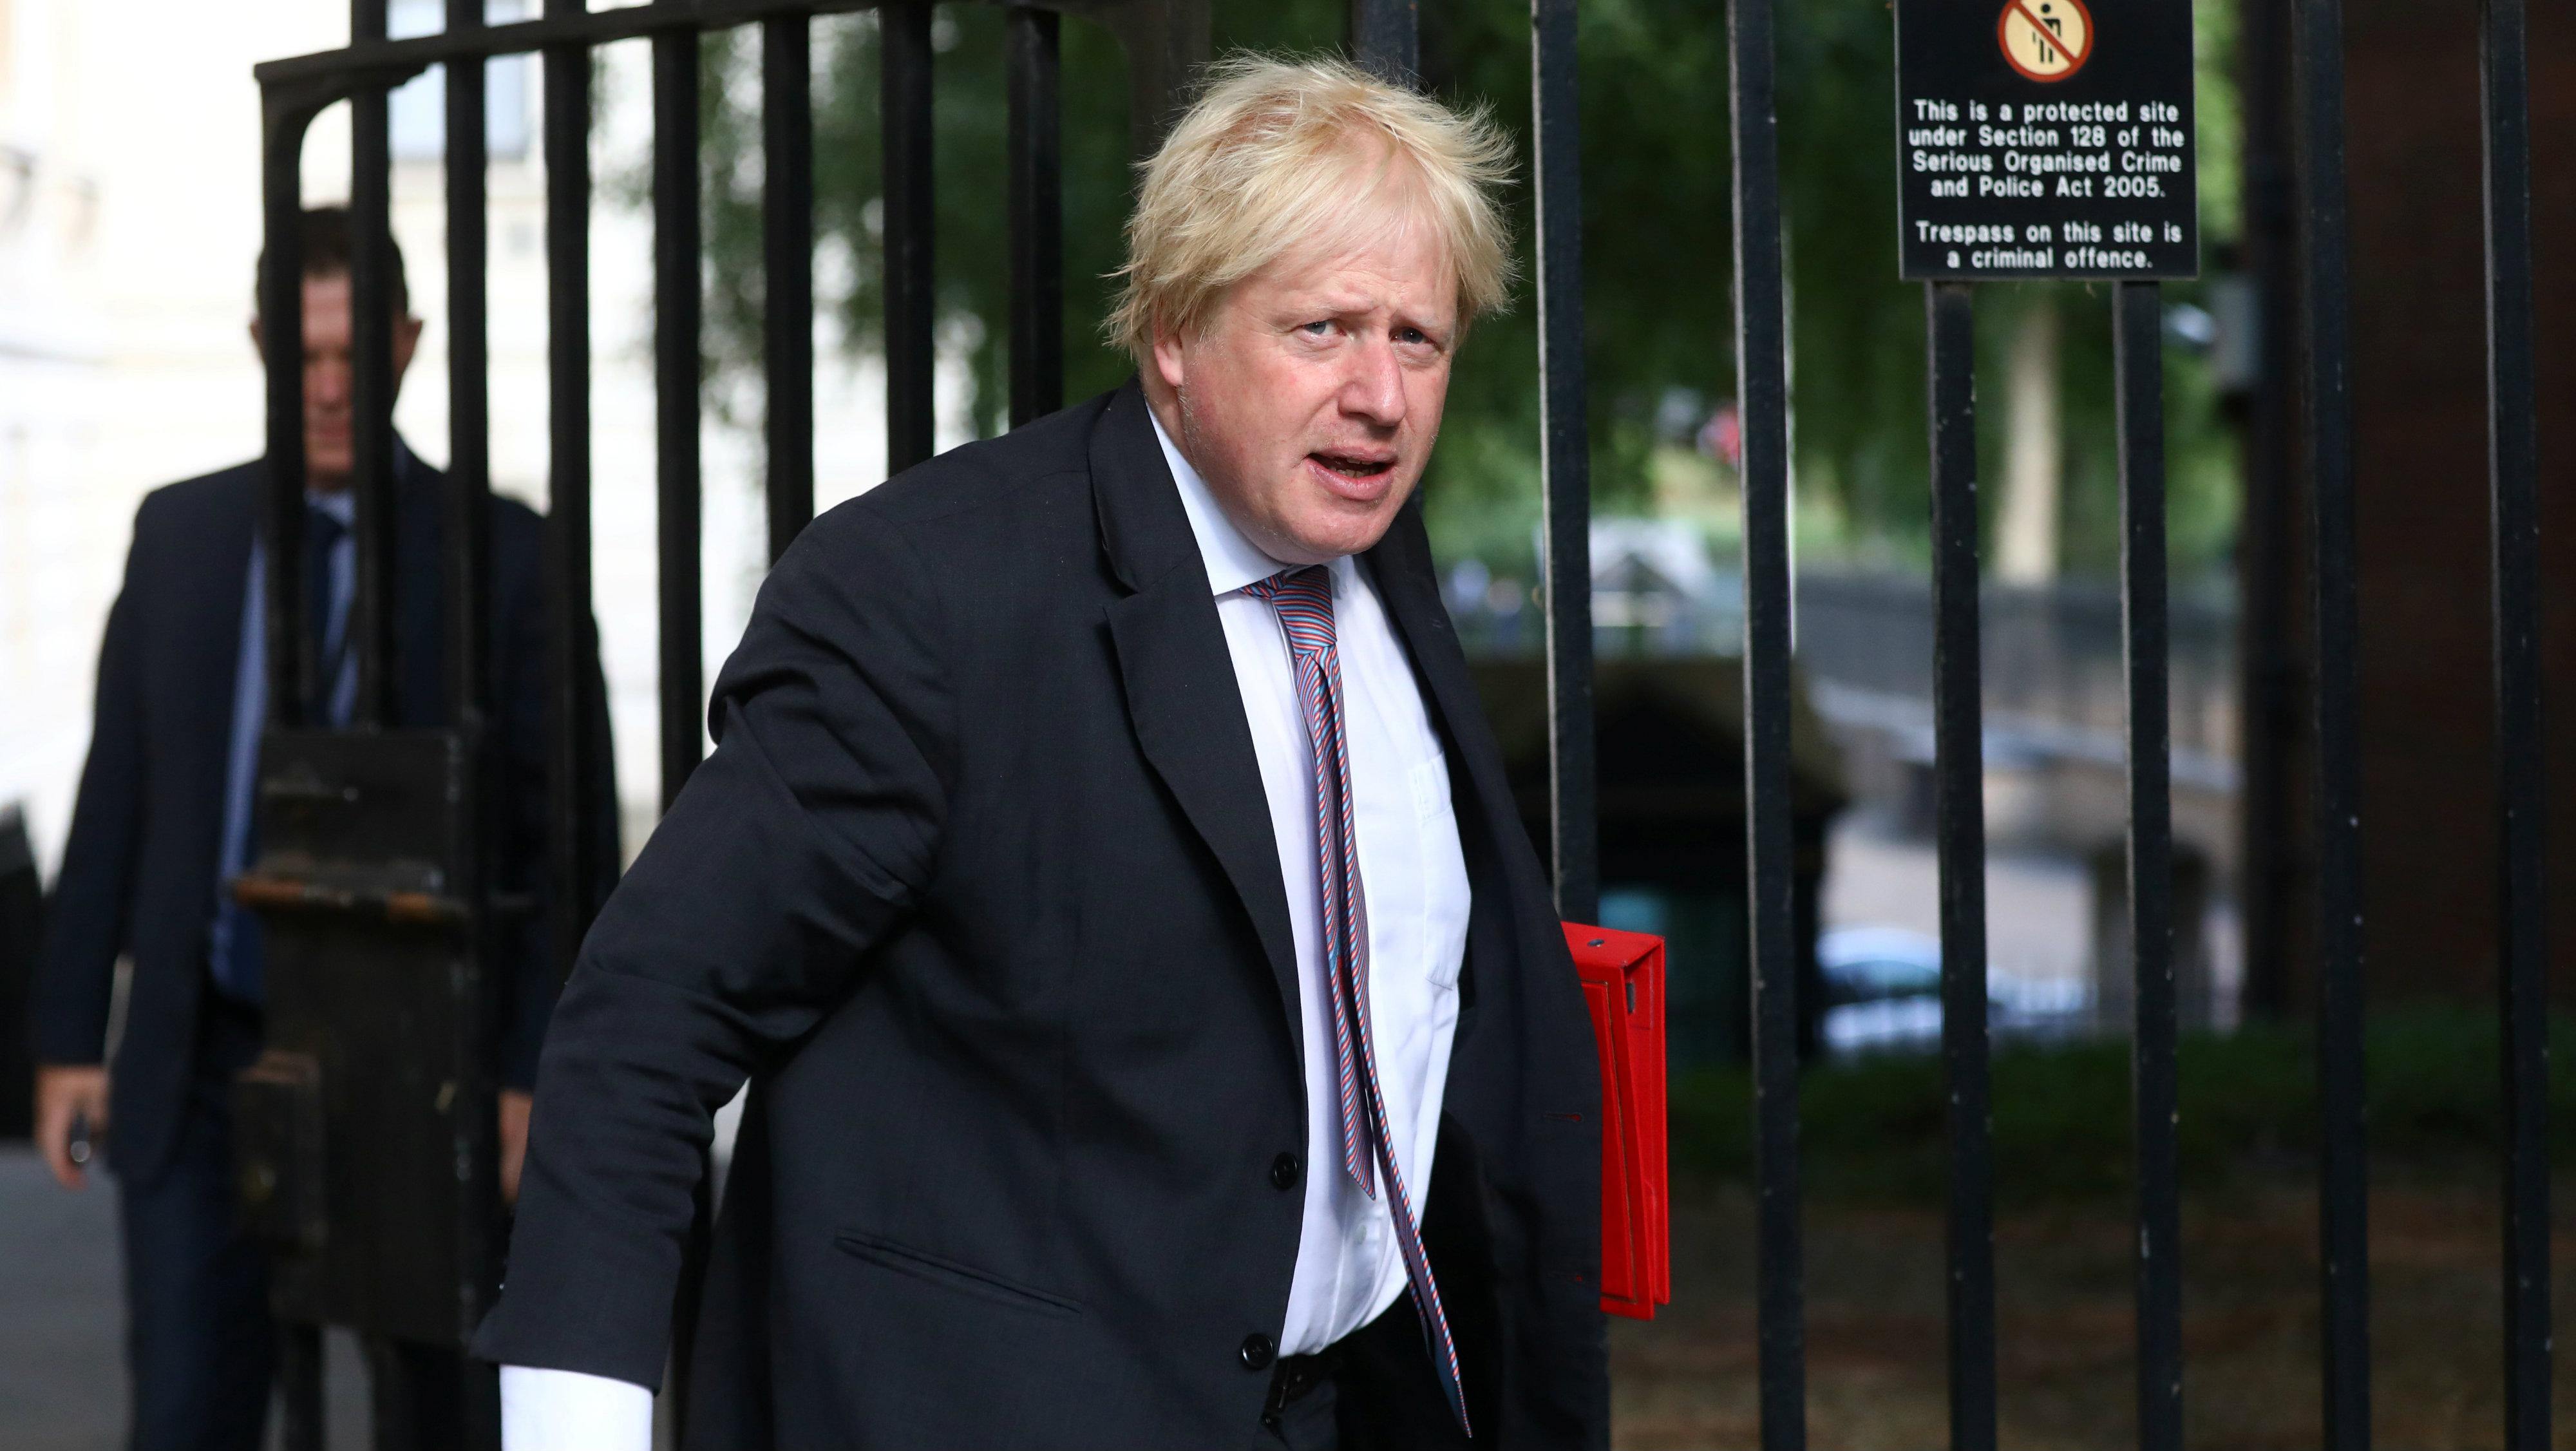 Boris Johnson arriving at Downing Street